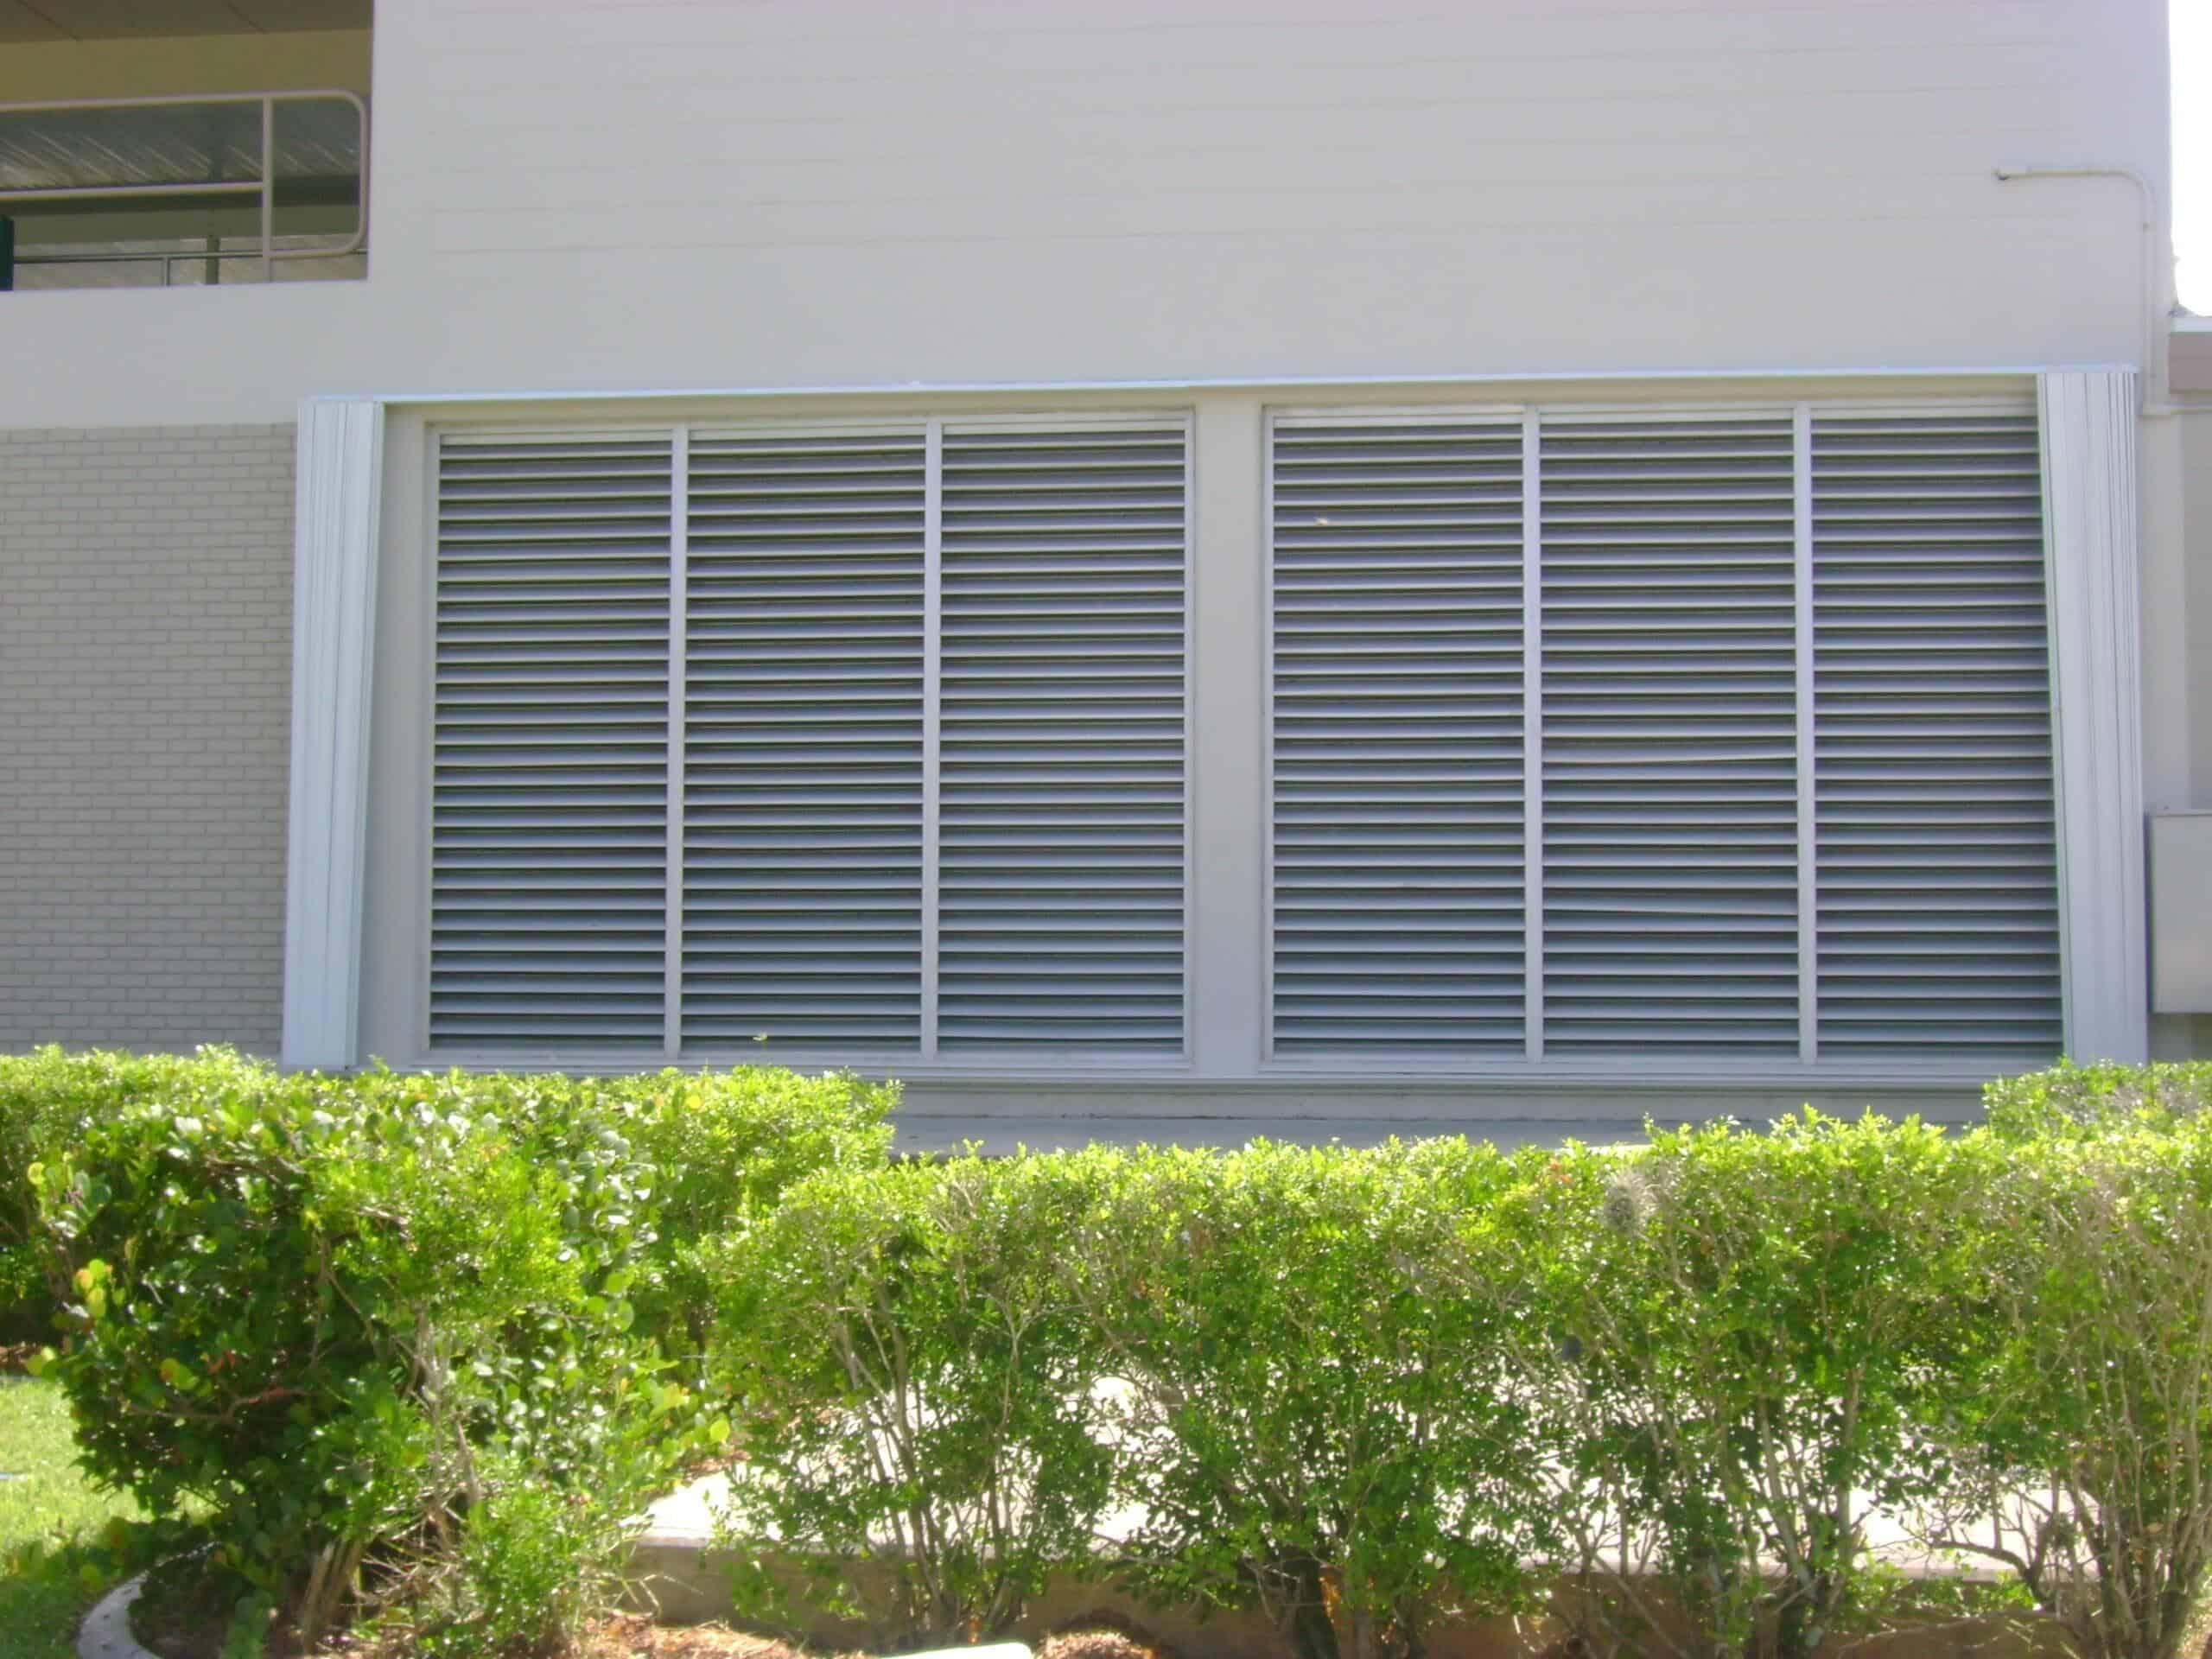 open accordion storm shutters